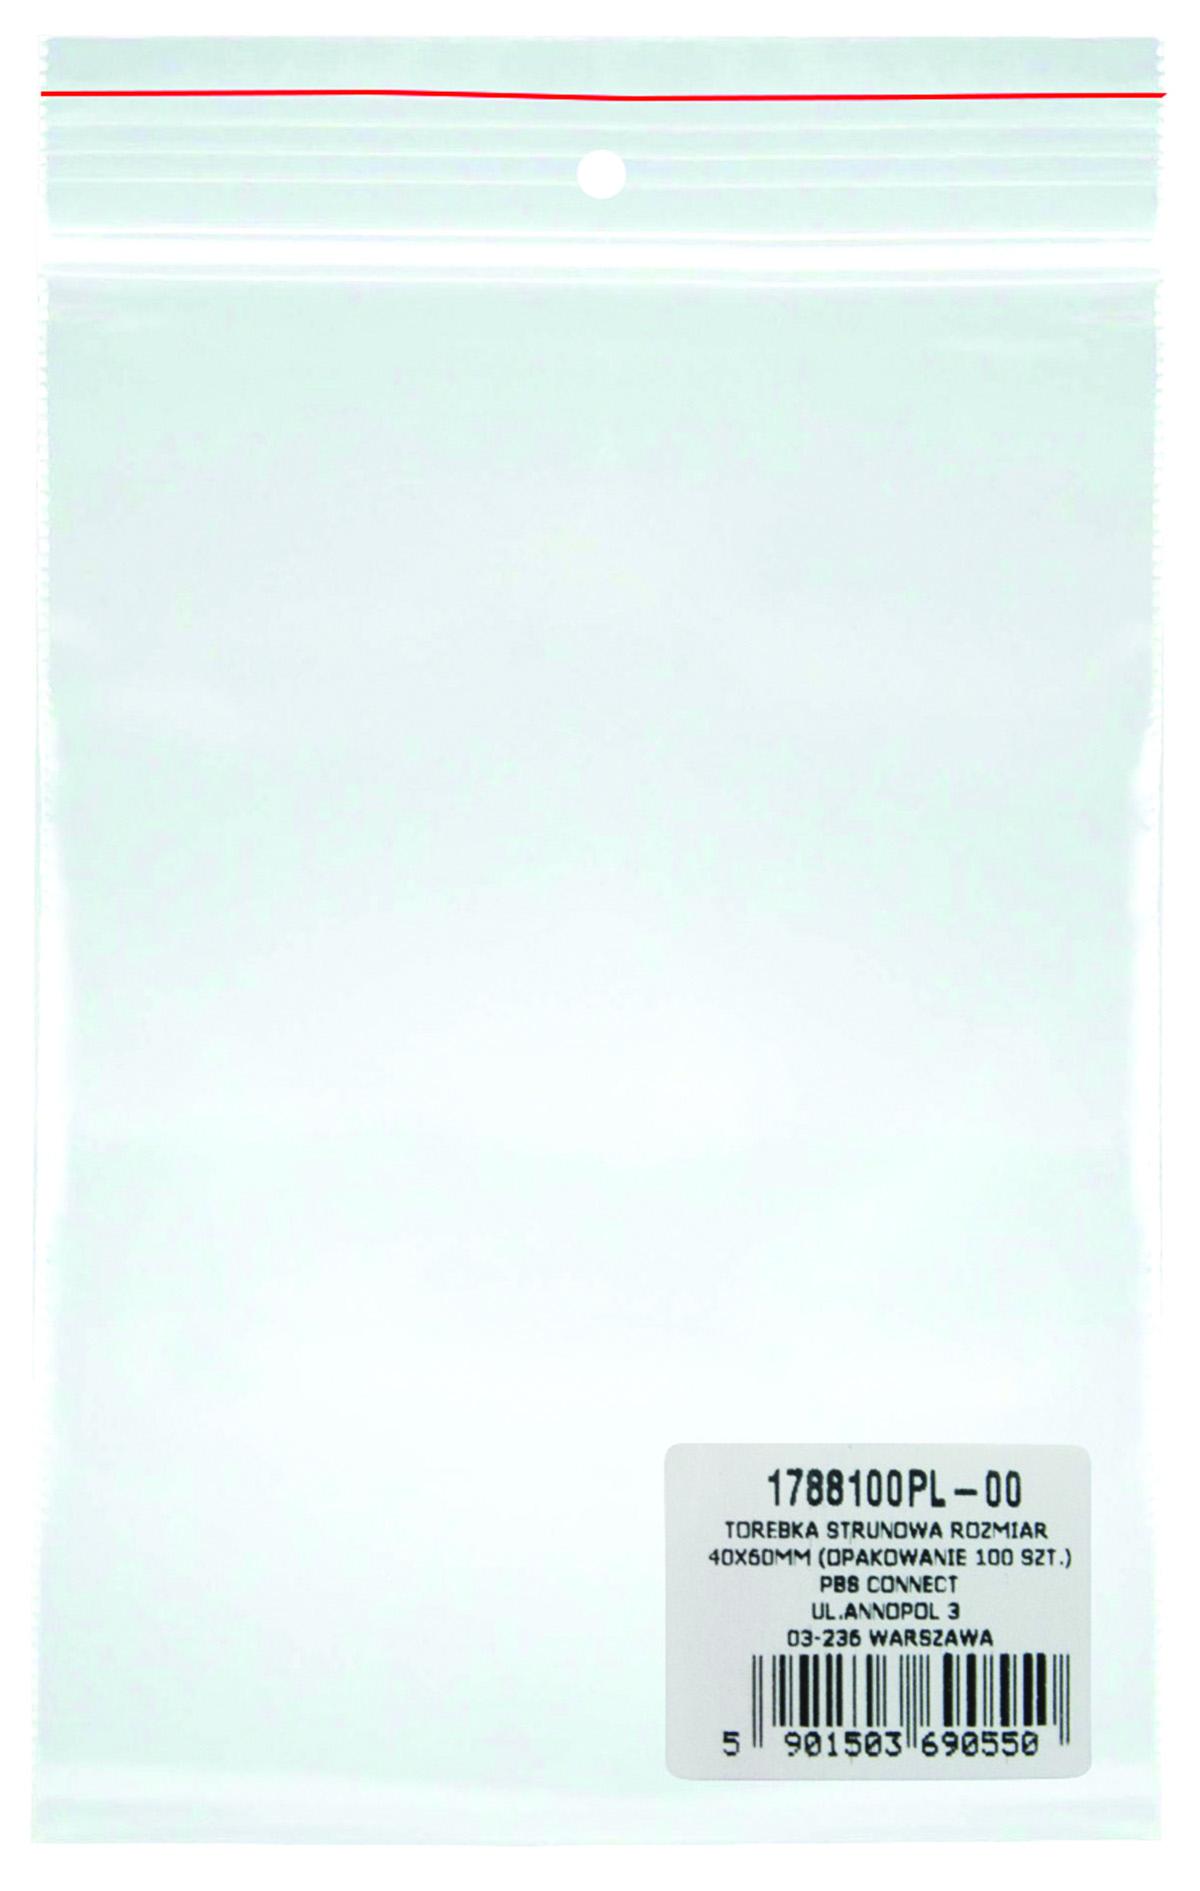 Pungi plastic cu fermoar pentru sigilare, 40 x 60 mm, 40 microni, 100 buc/set, DONAU -transparente